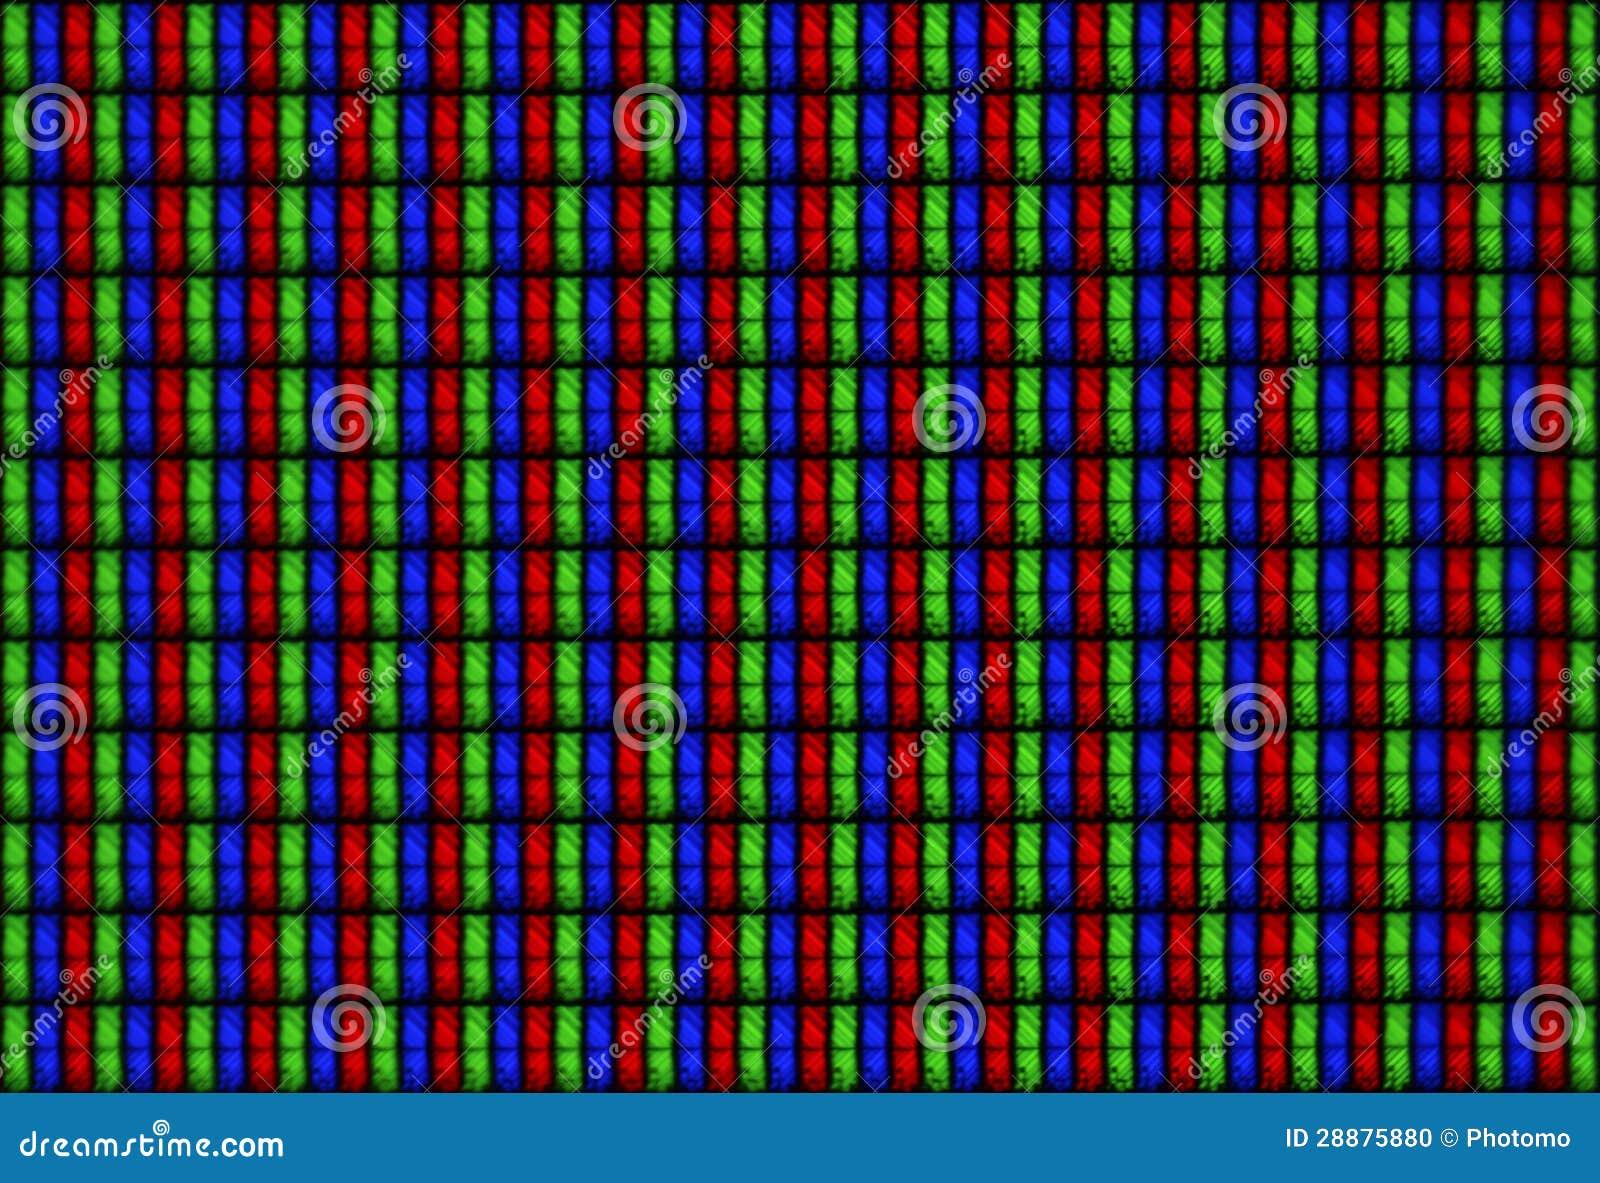 Tilable Texture Display LCD RGB - Macro Stock Photo ...